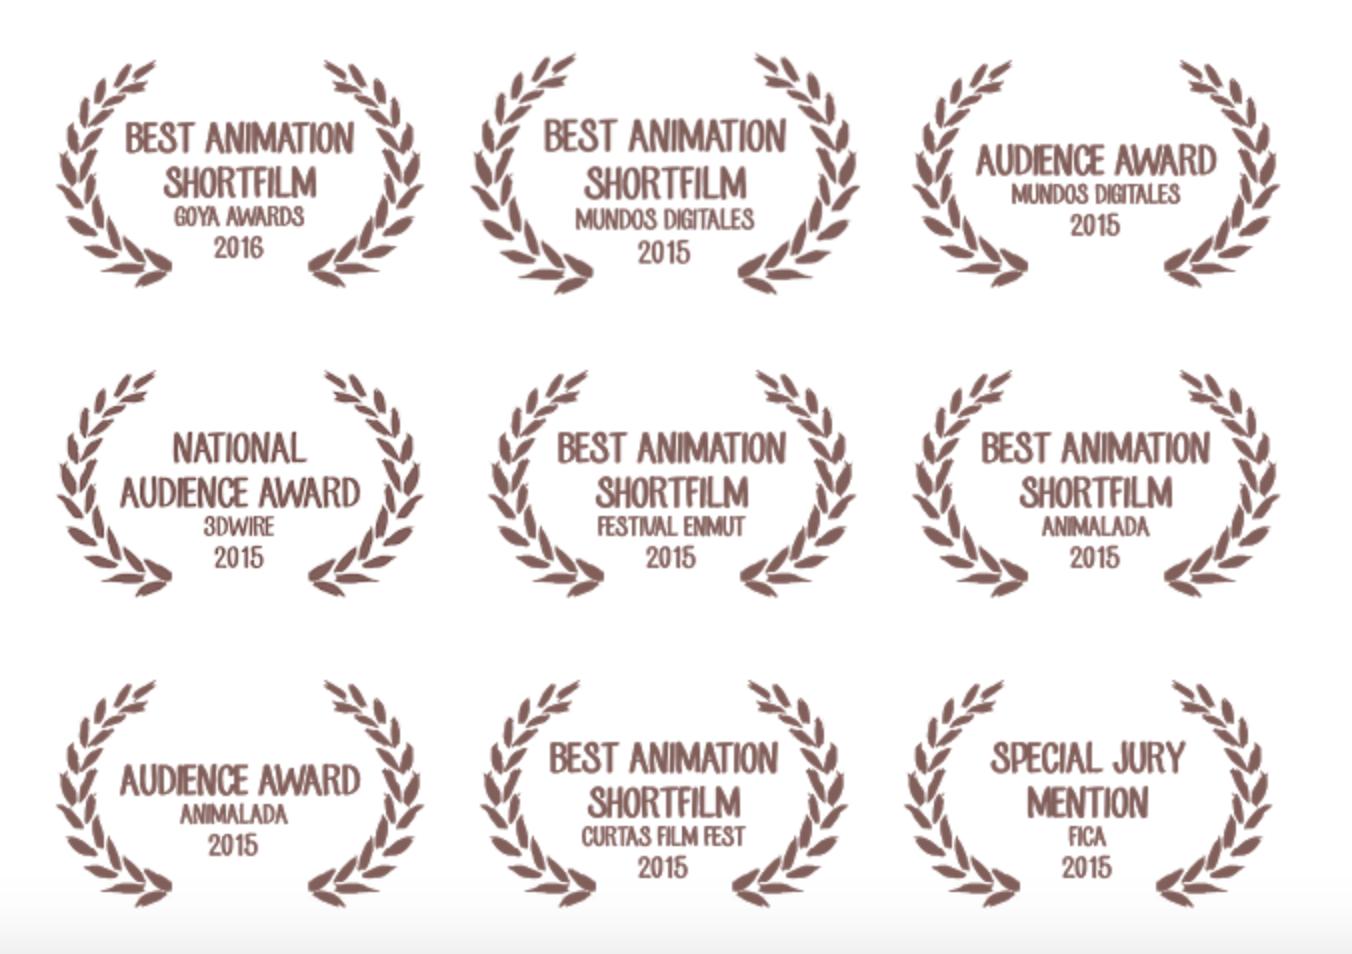 Algunos premios corto Alike